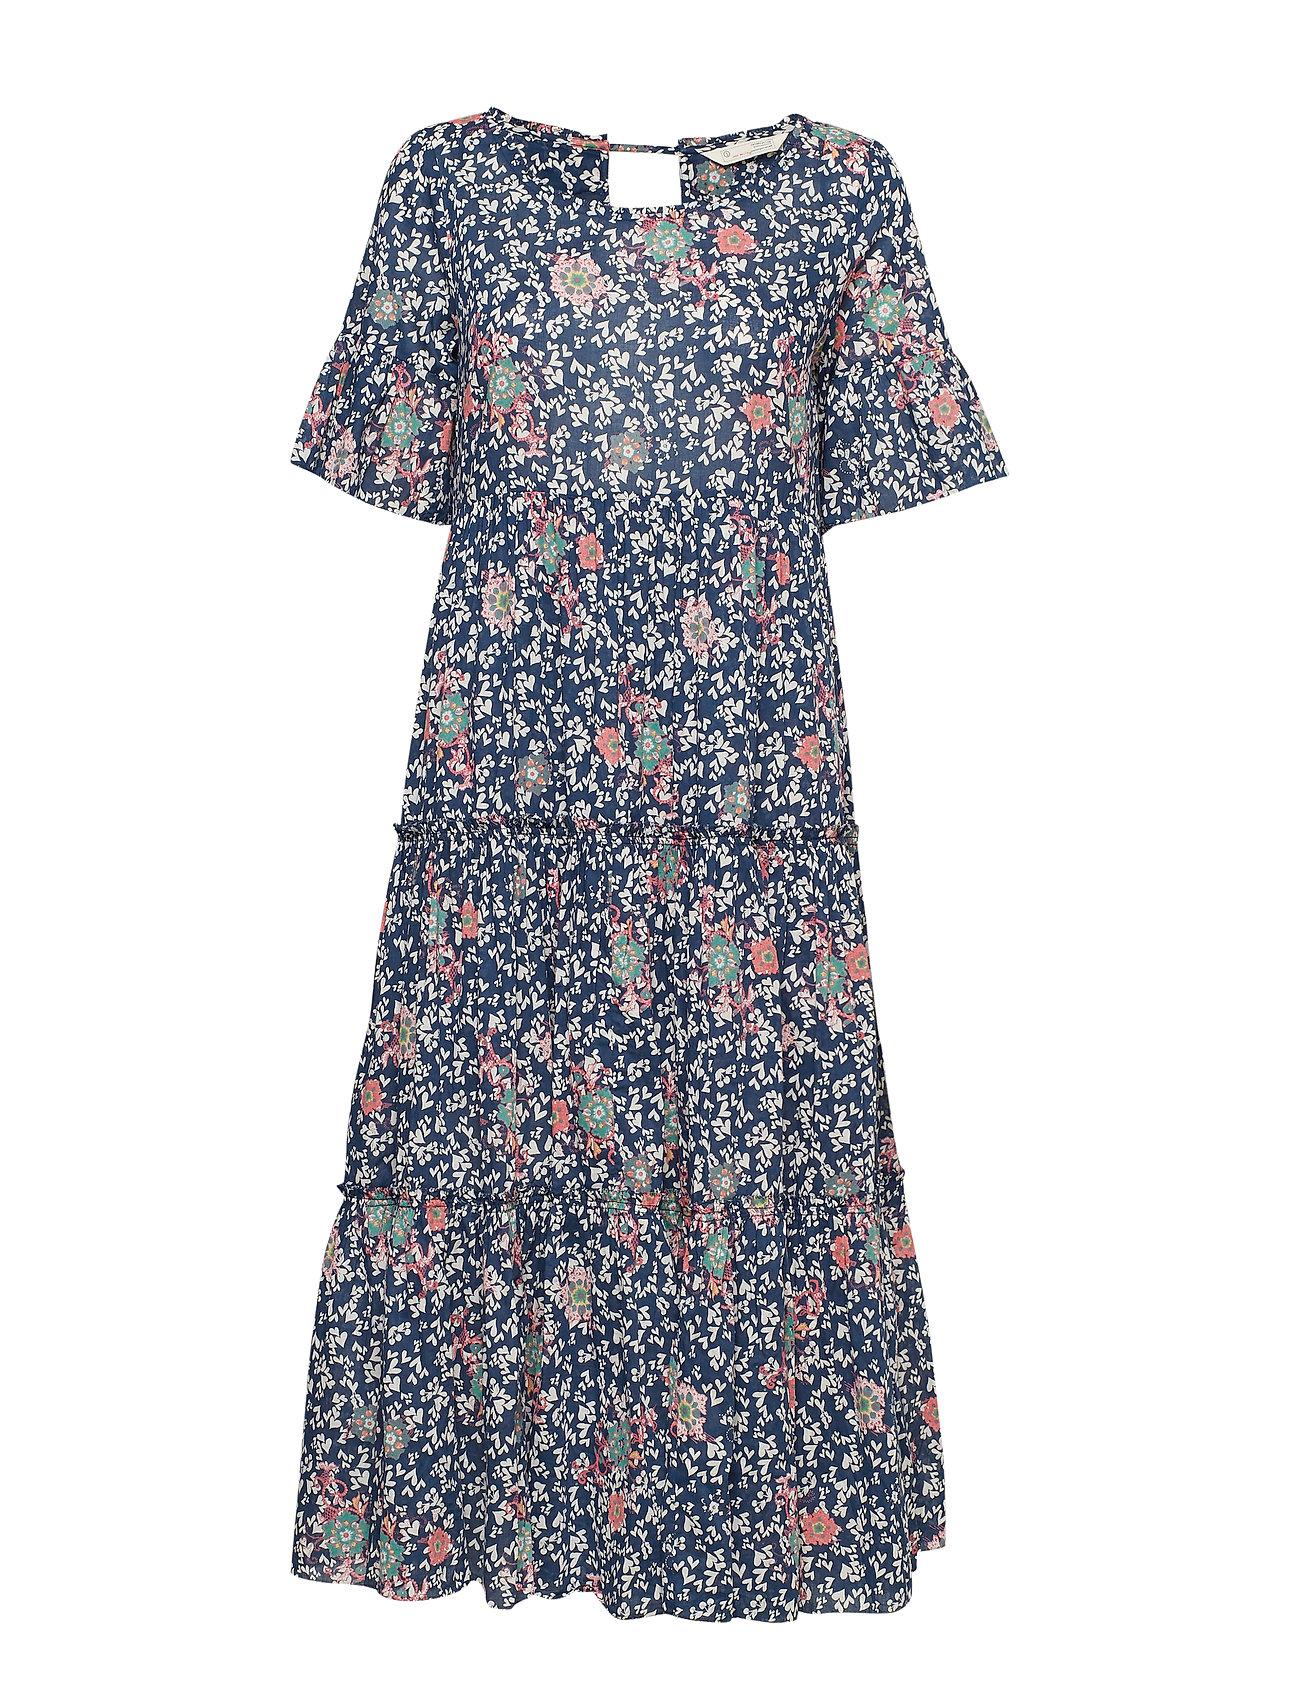 fa27aa48 Lush Shake Dress (Deep Sea) (£118.30) - ODD MOLLY -   Boozt.com